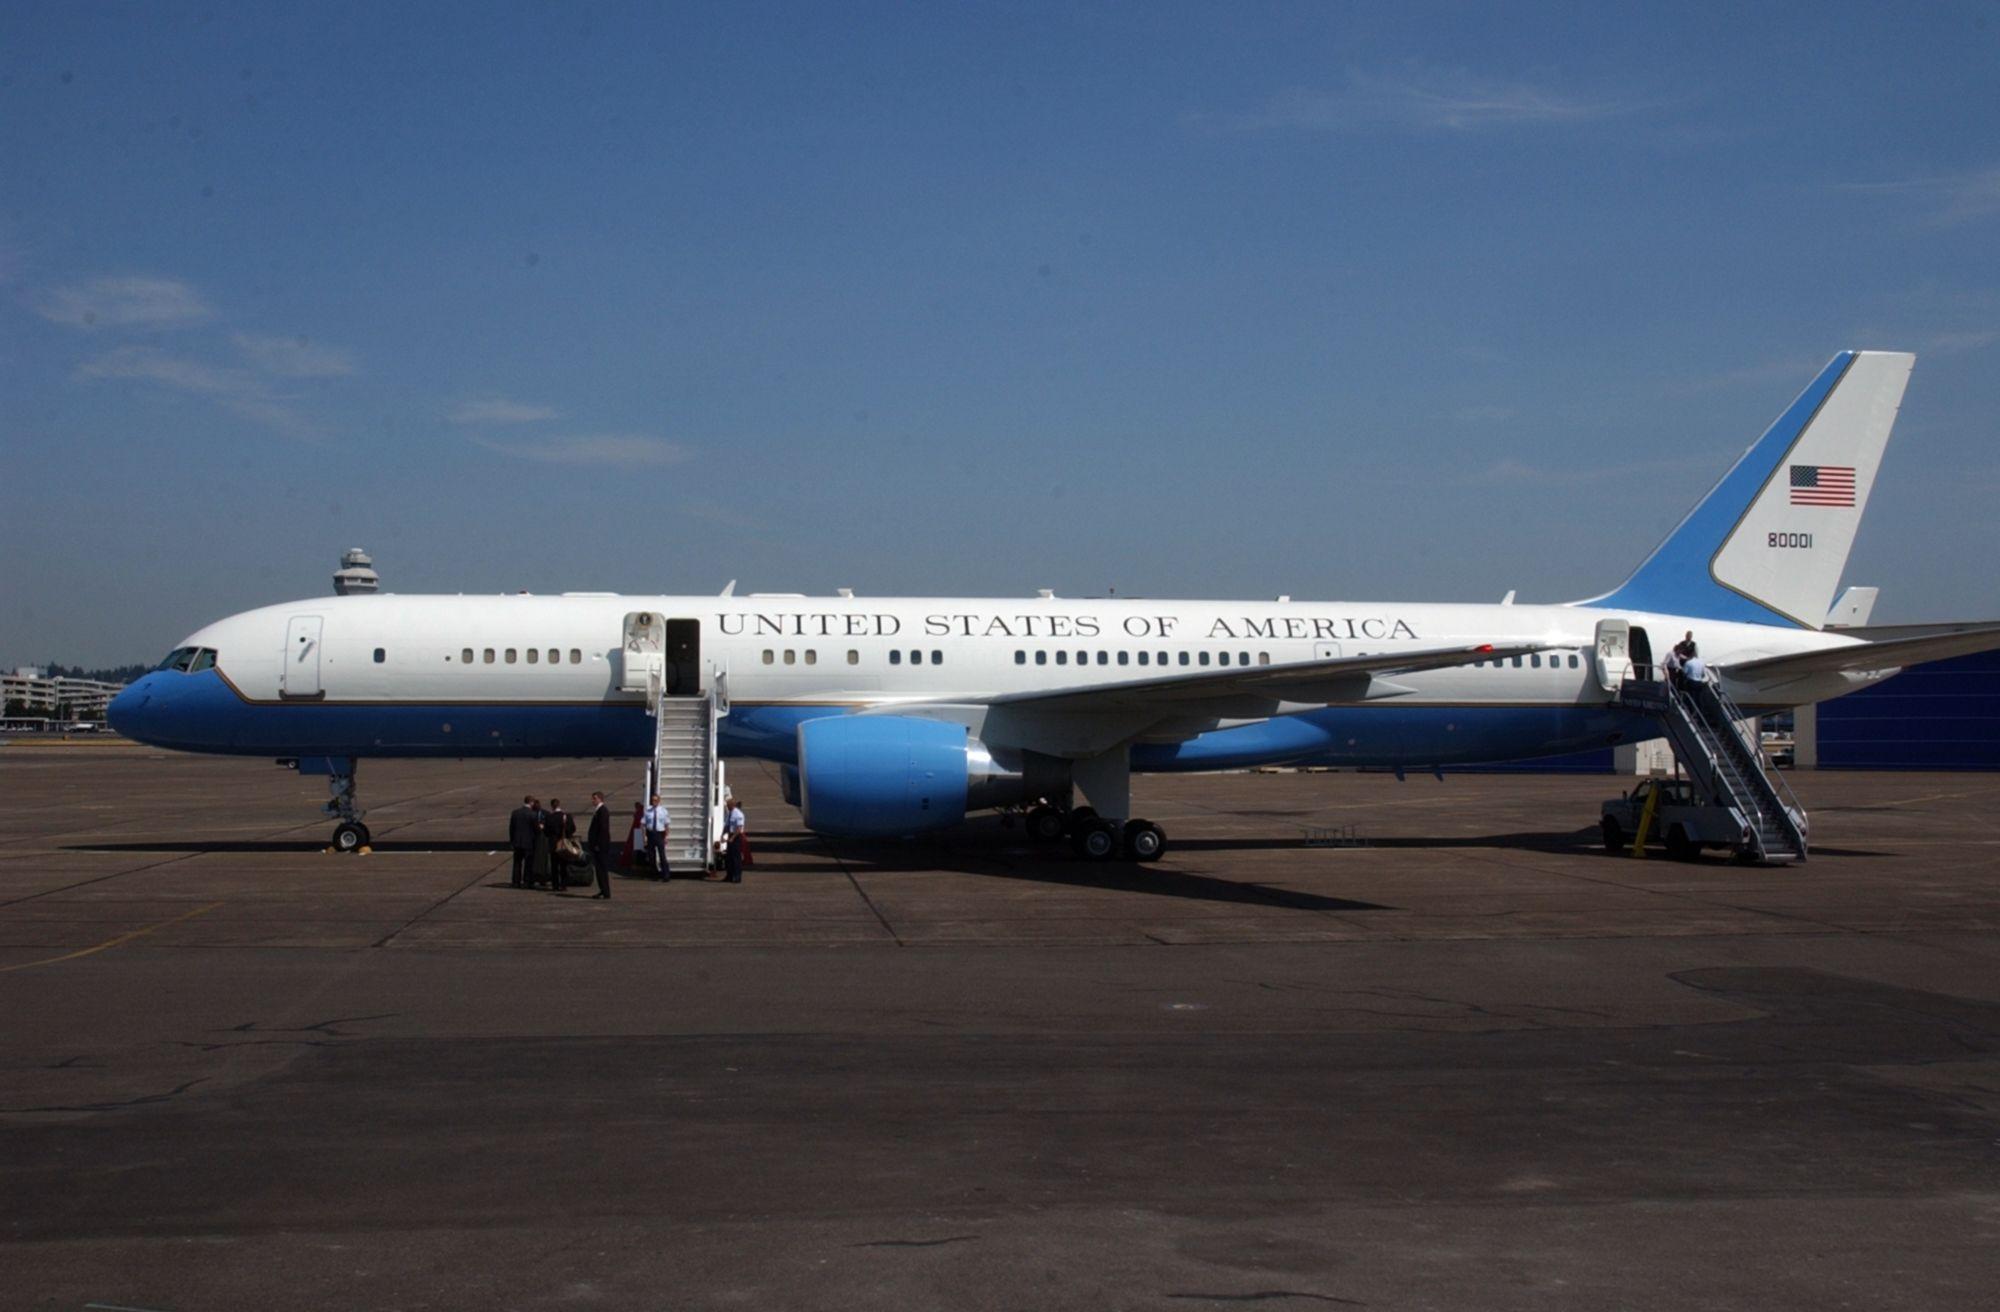 Boeing C-32a